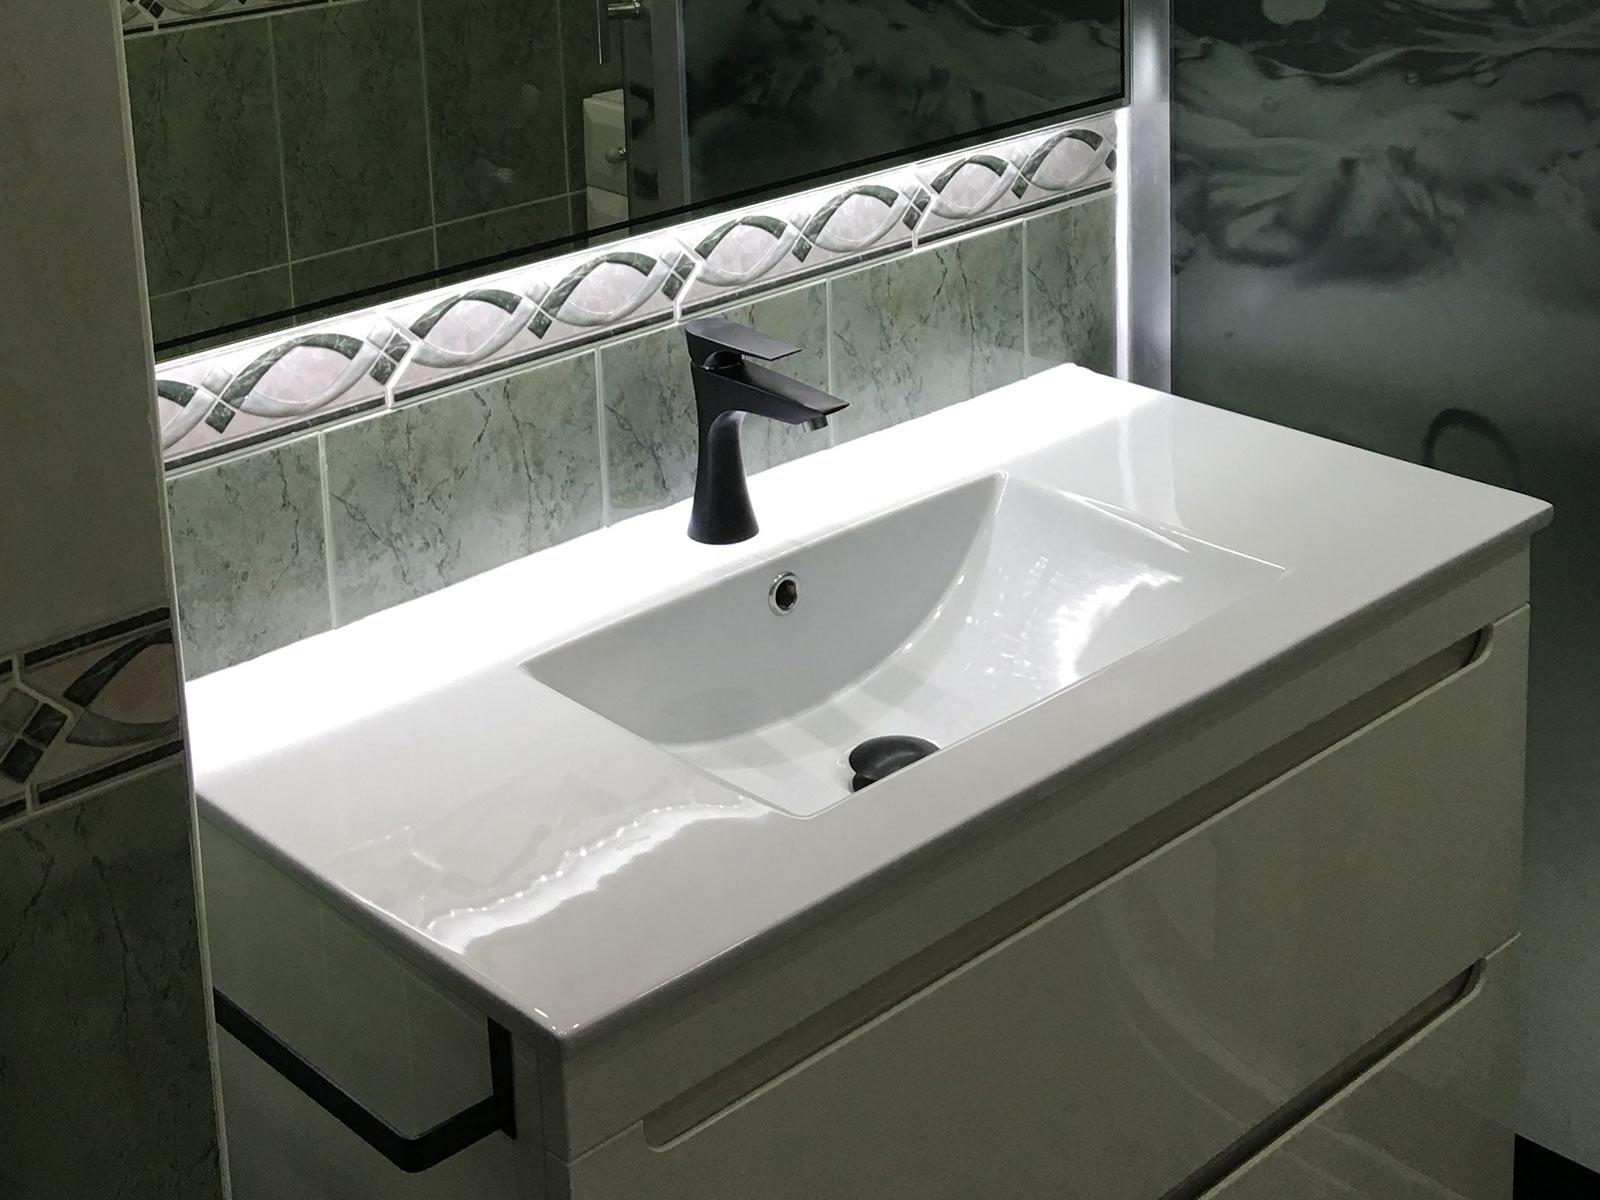 Monomando lavabo Athenea, acabado negro mate.